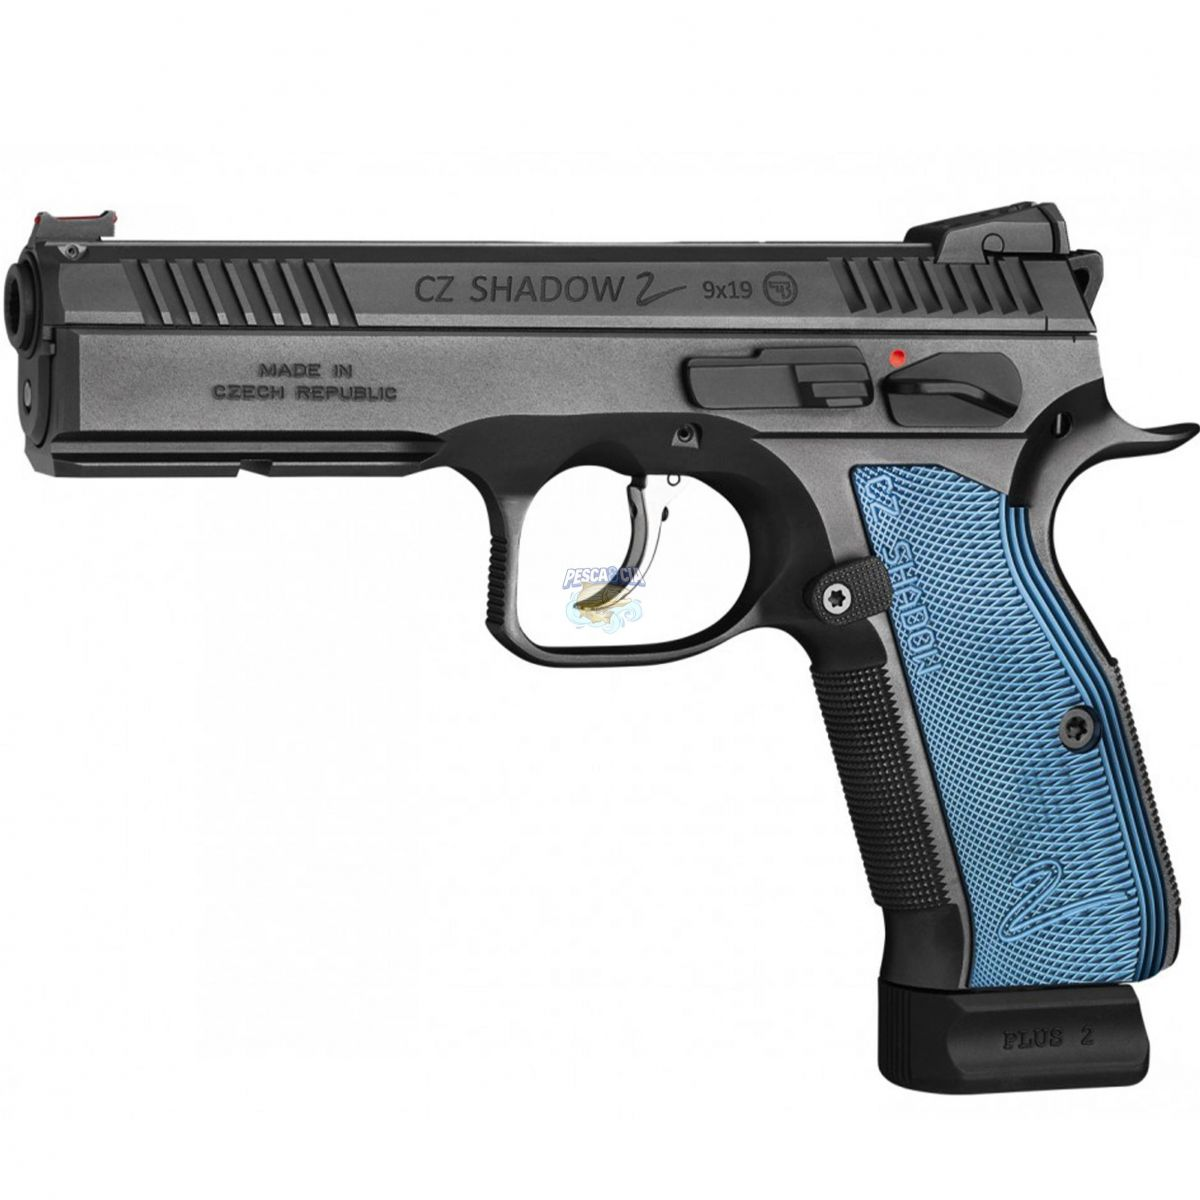 "Pistola Ceska Zbrojovka CZ Shadow 2 Cal.9mm Oxidada (TALA AZUL) 19 Tiros- Cano 4.7"""